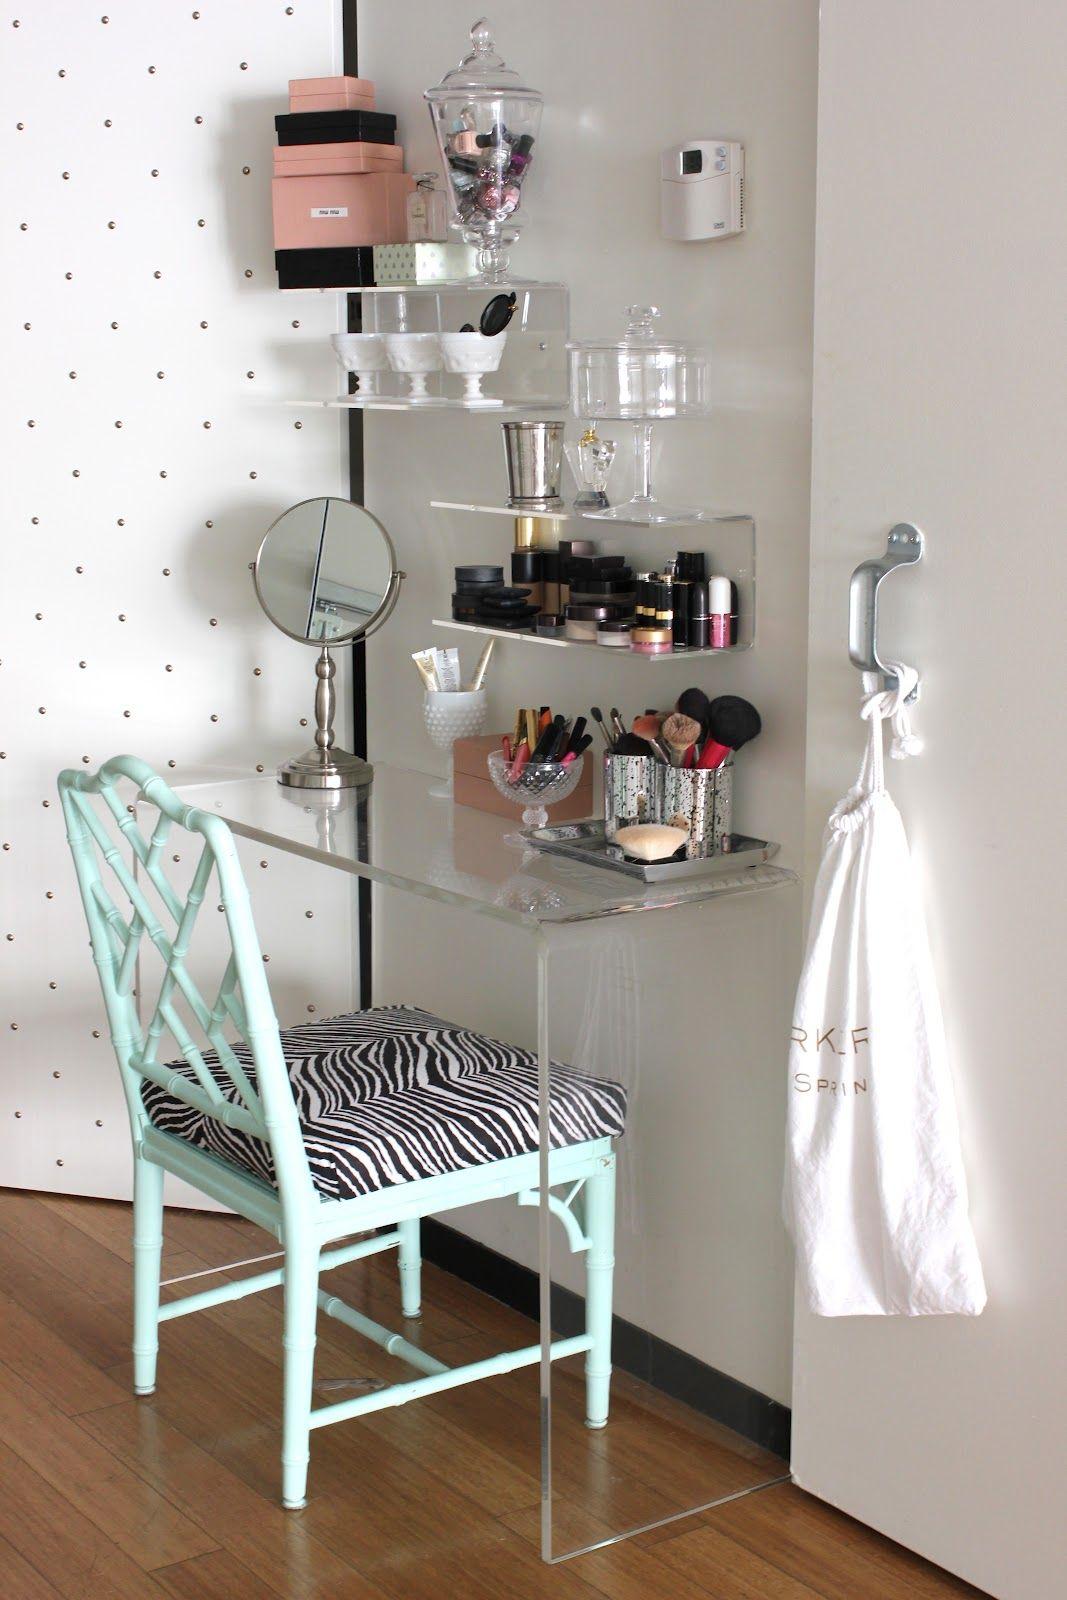 Pin by yasmin yuridia on tocadores pinterest vanities bedrooms